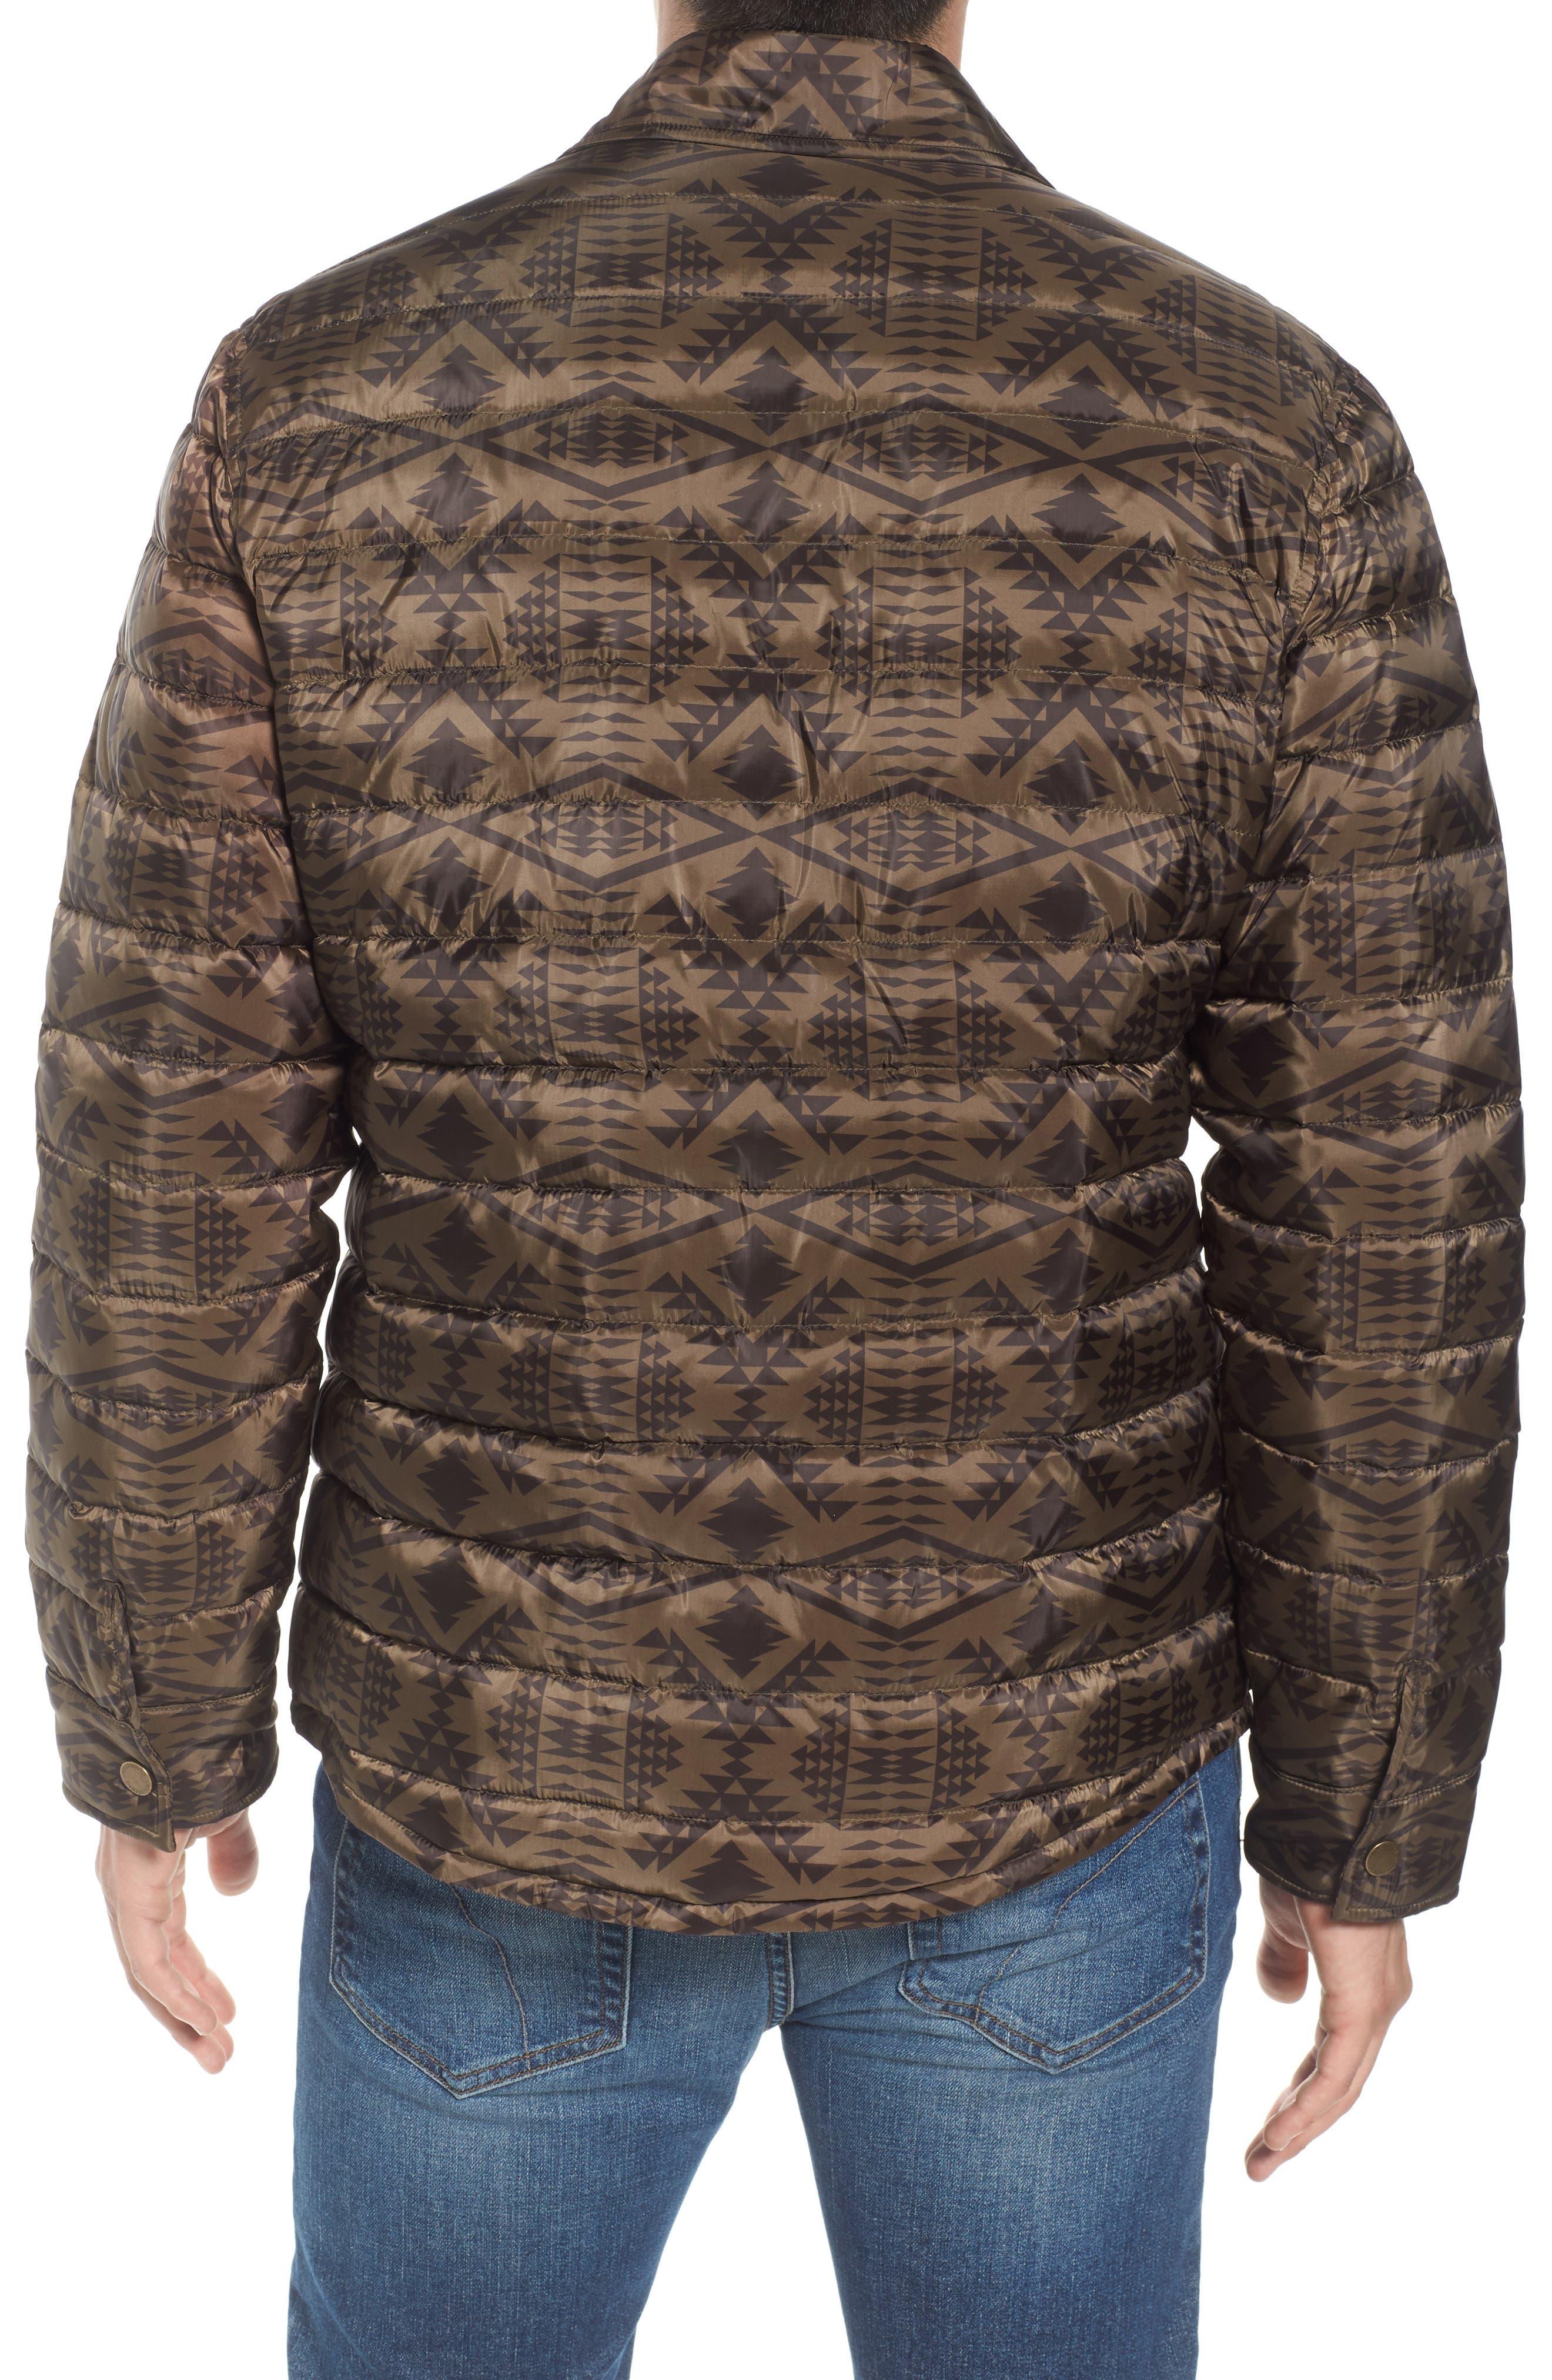 Moab Water Resistant Down Shirt Jacket,                             Alternate thumbnail 2, color,                             342